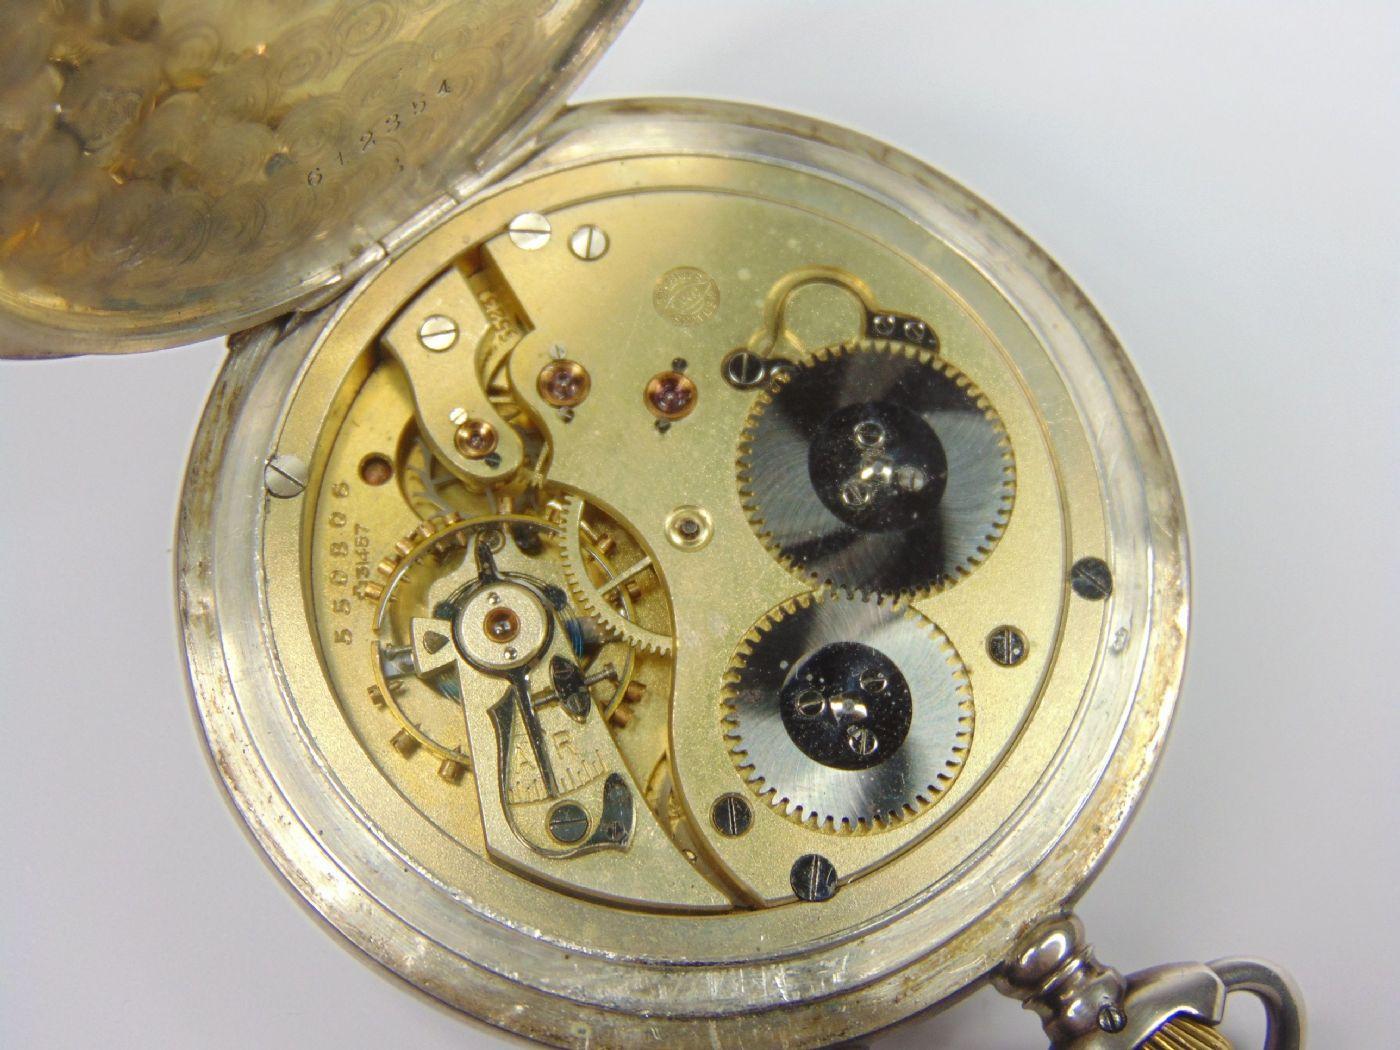 thumb6|Orologio da tasca in argento International Watch Co. fine '800